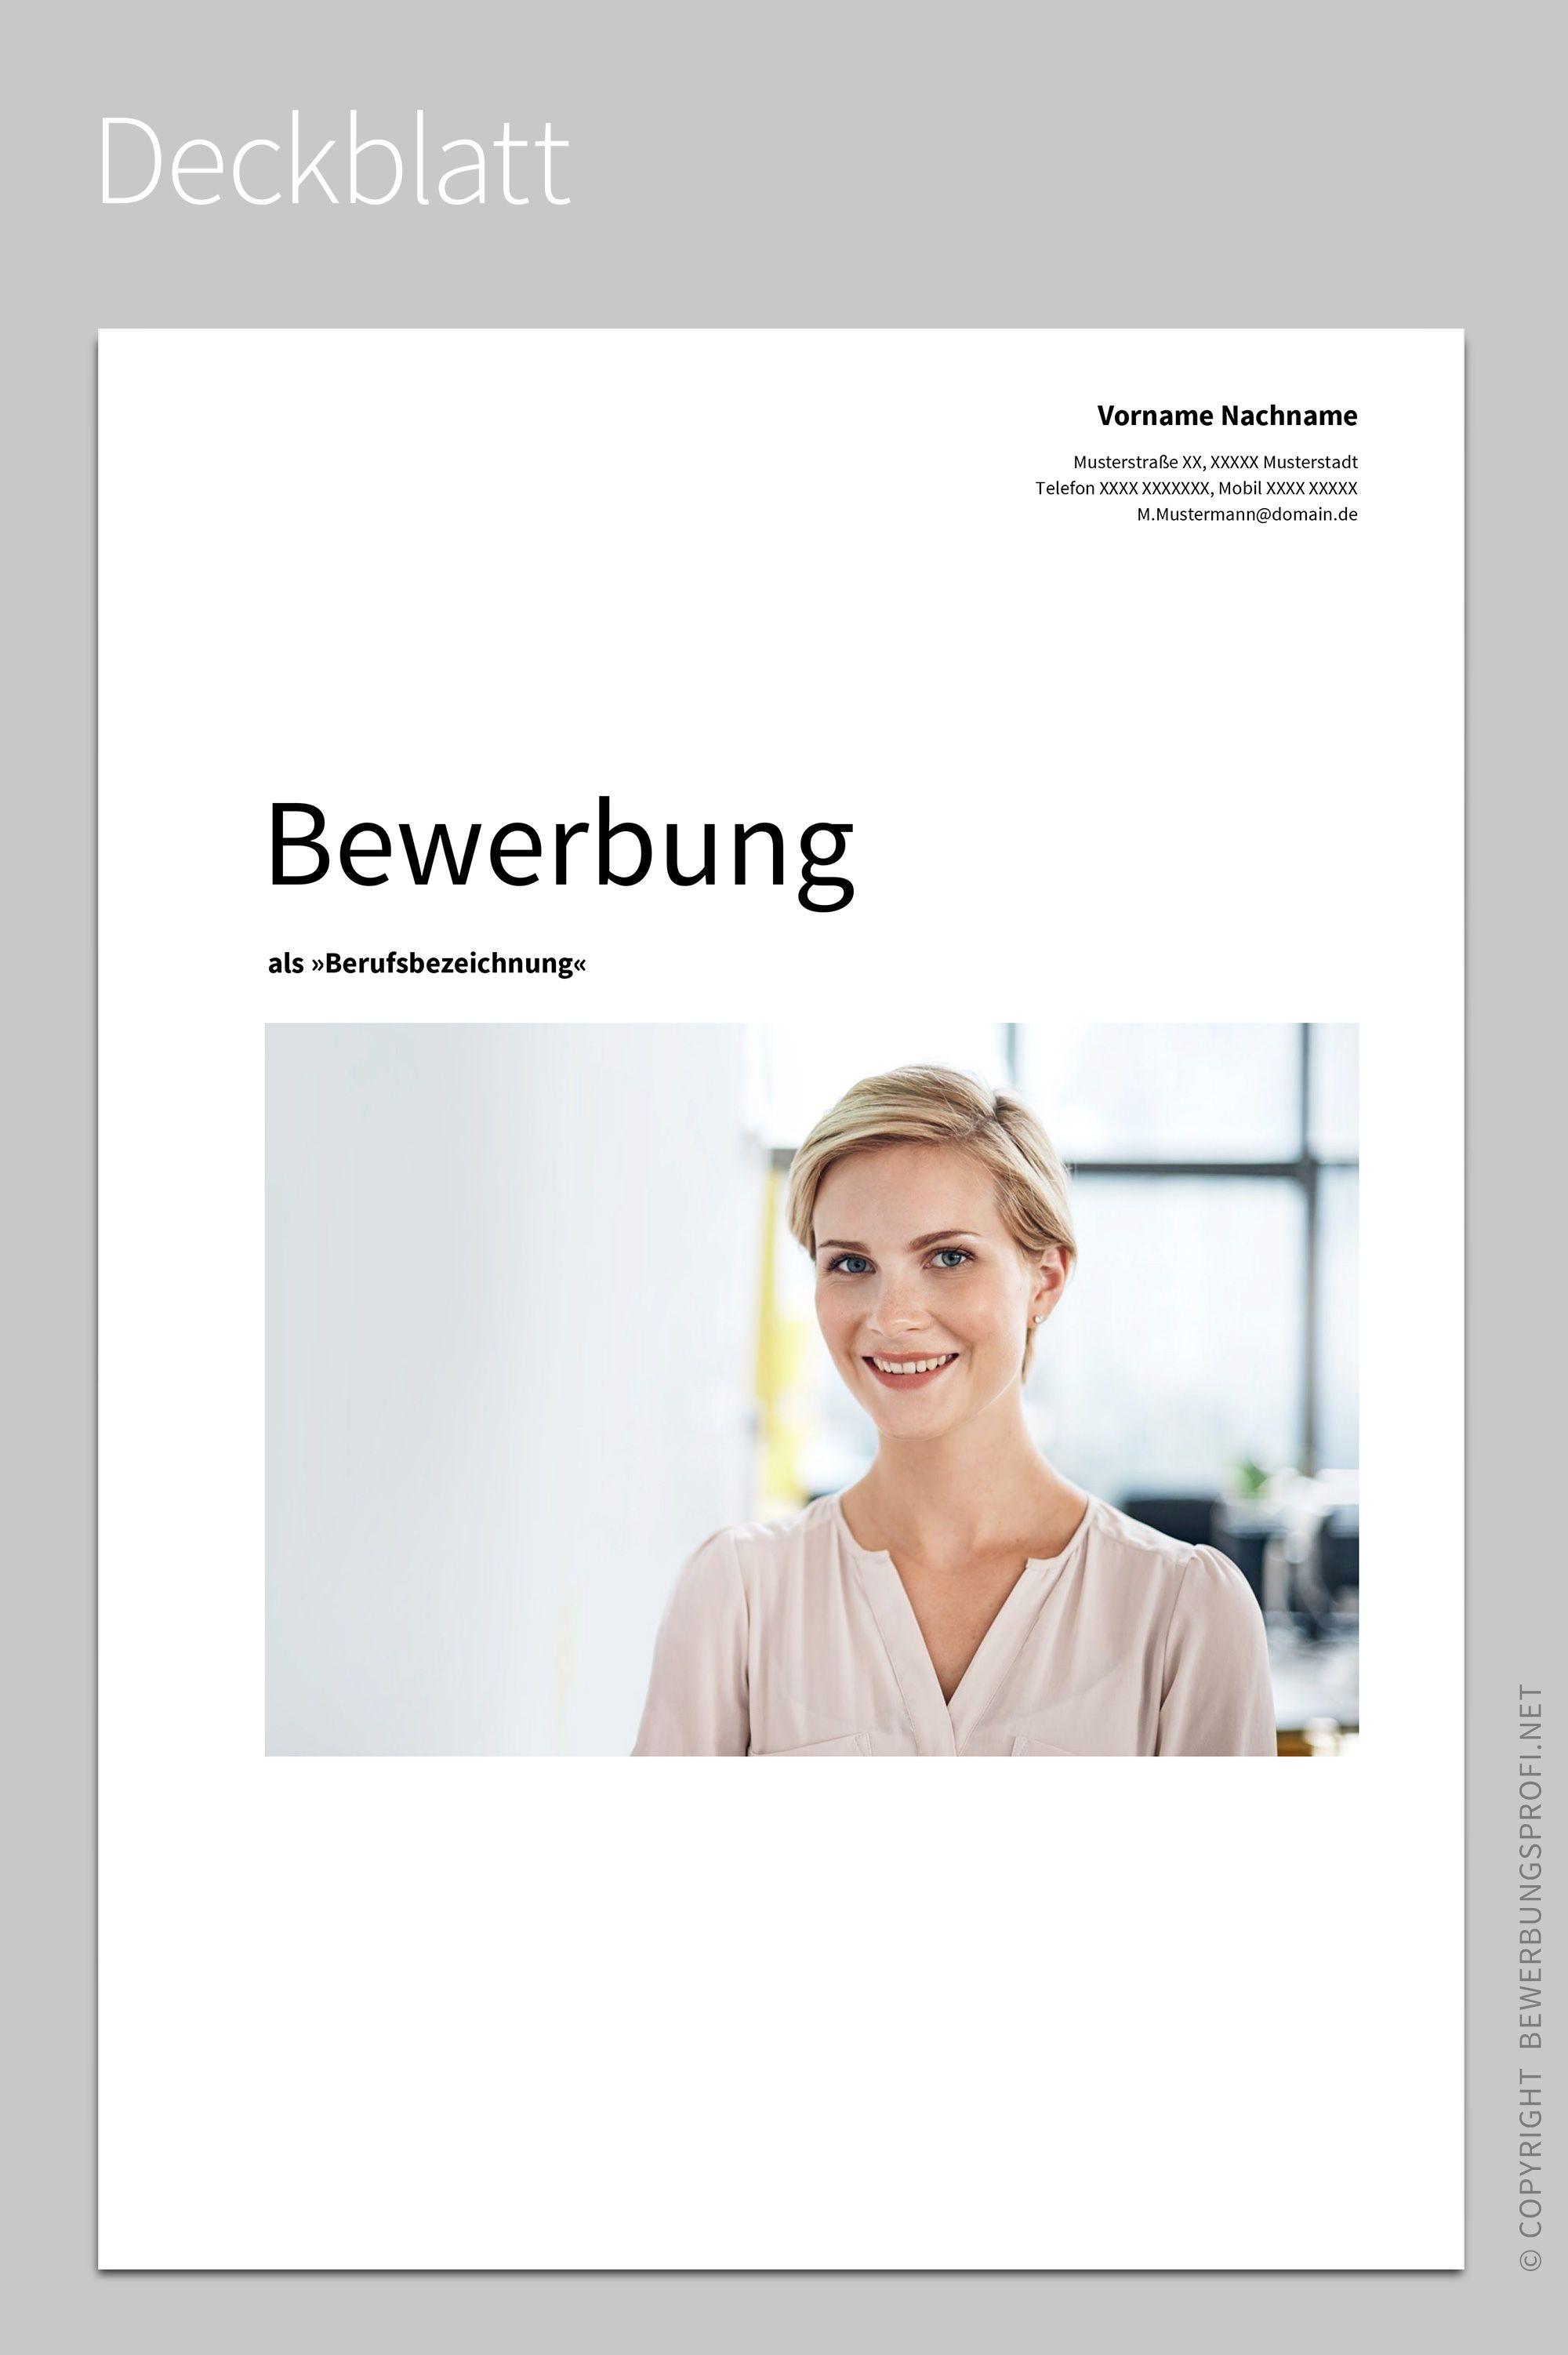 Deckblatt Albus Deckblatt Bewerbung Online Bewerbung Bewerbung